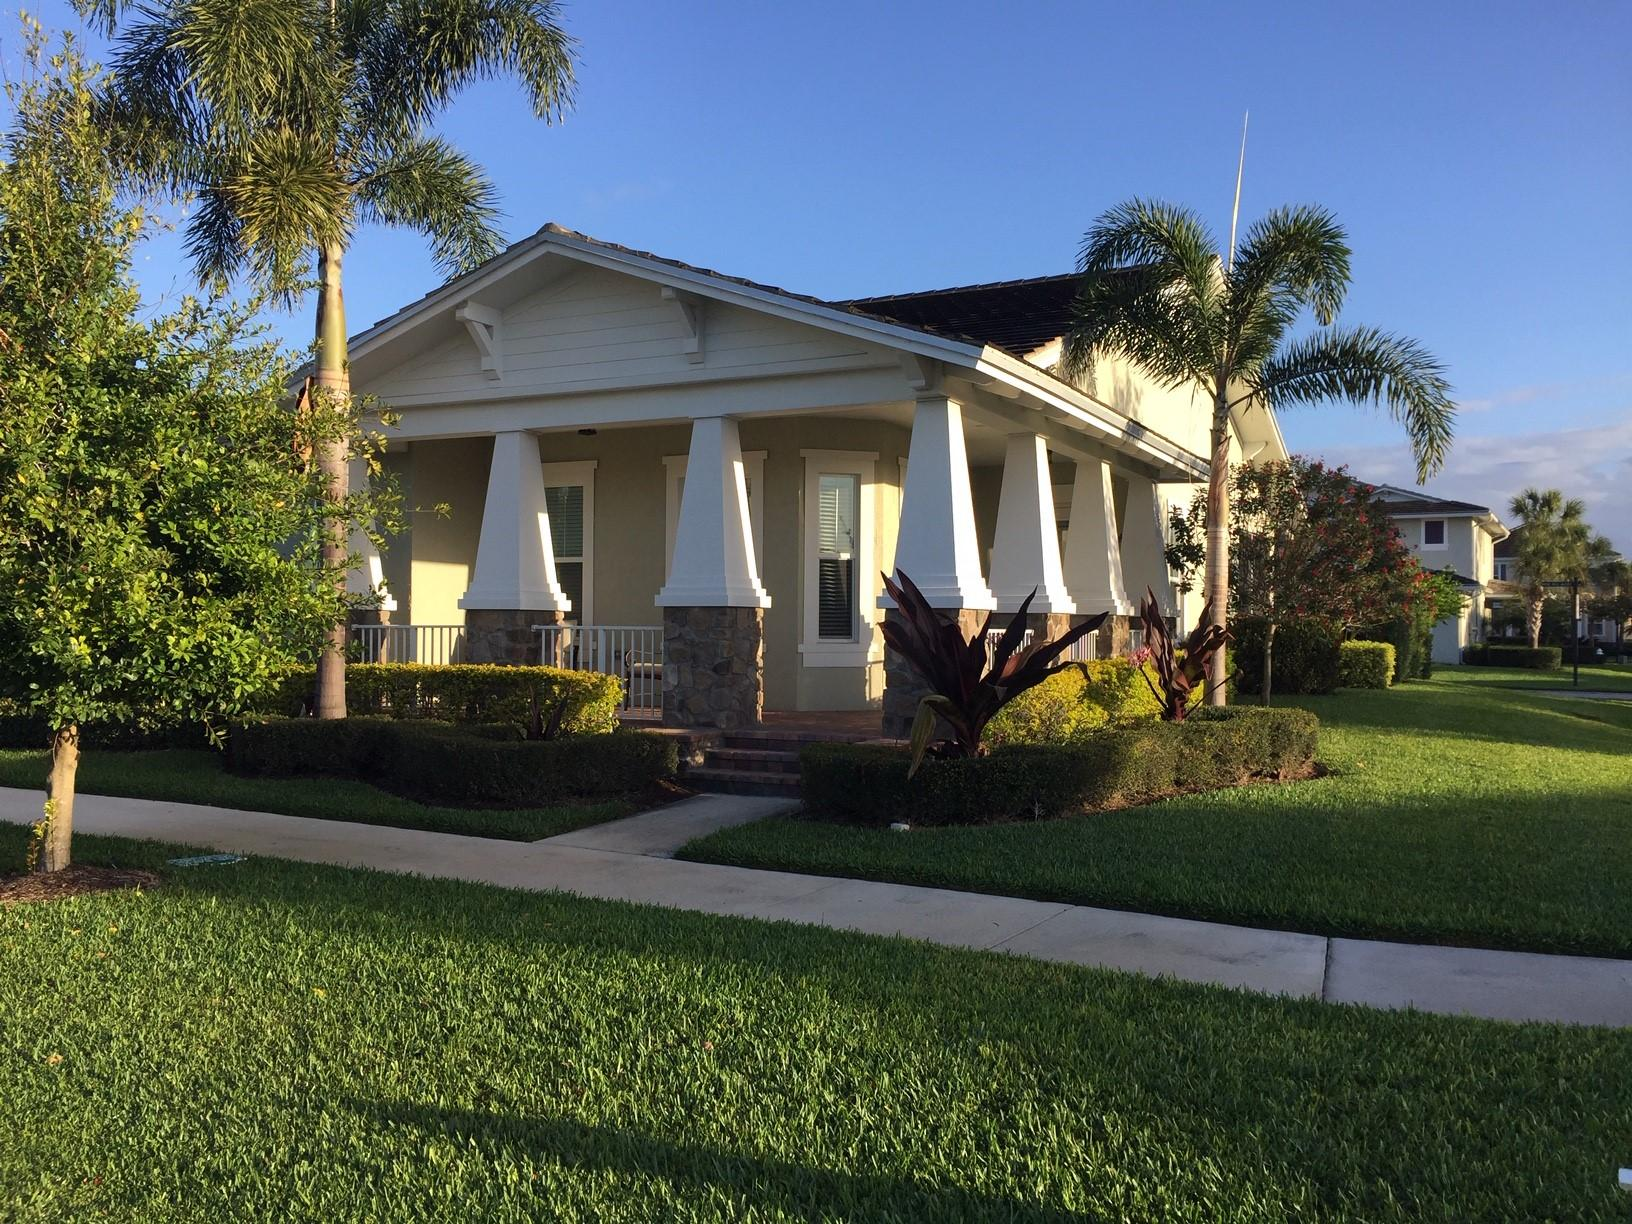 1347 Telfair Drive, Jupiter, Florida 33458, 3 Bedrooms Bedrooms, ,2 BathroomsBathrooms,A,Single family,Telfair,RX-10505134